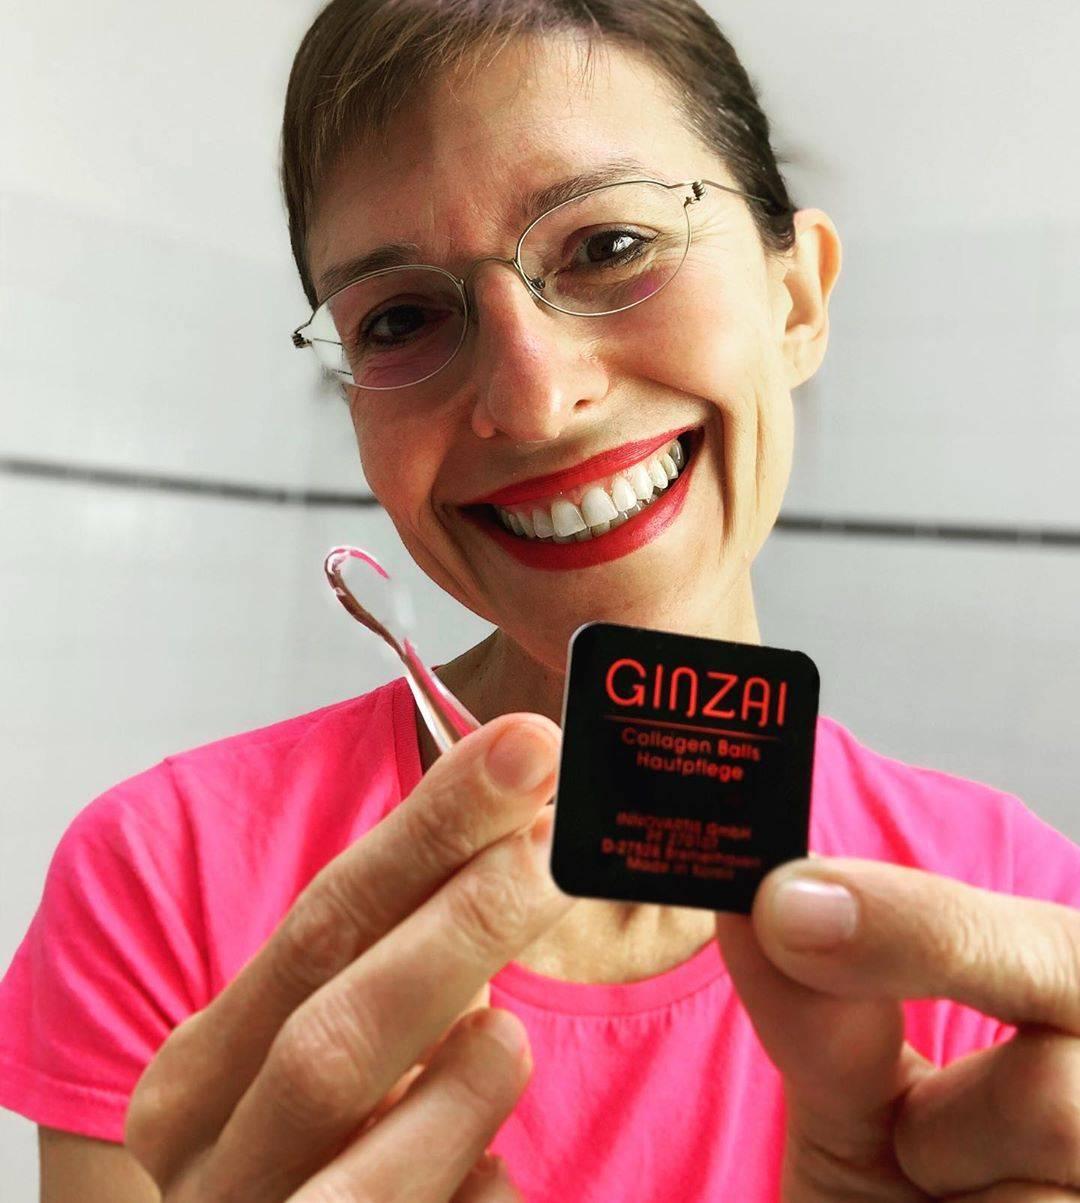 GINZAI Collagen Pflegeperlen